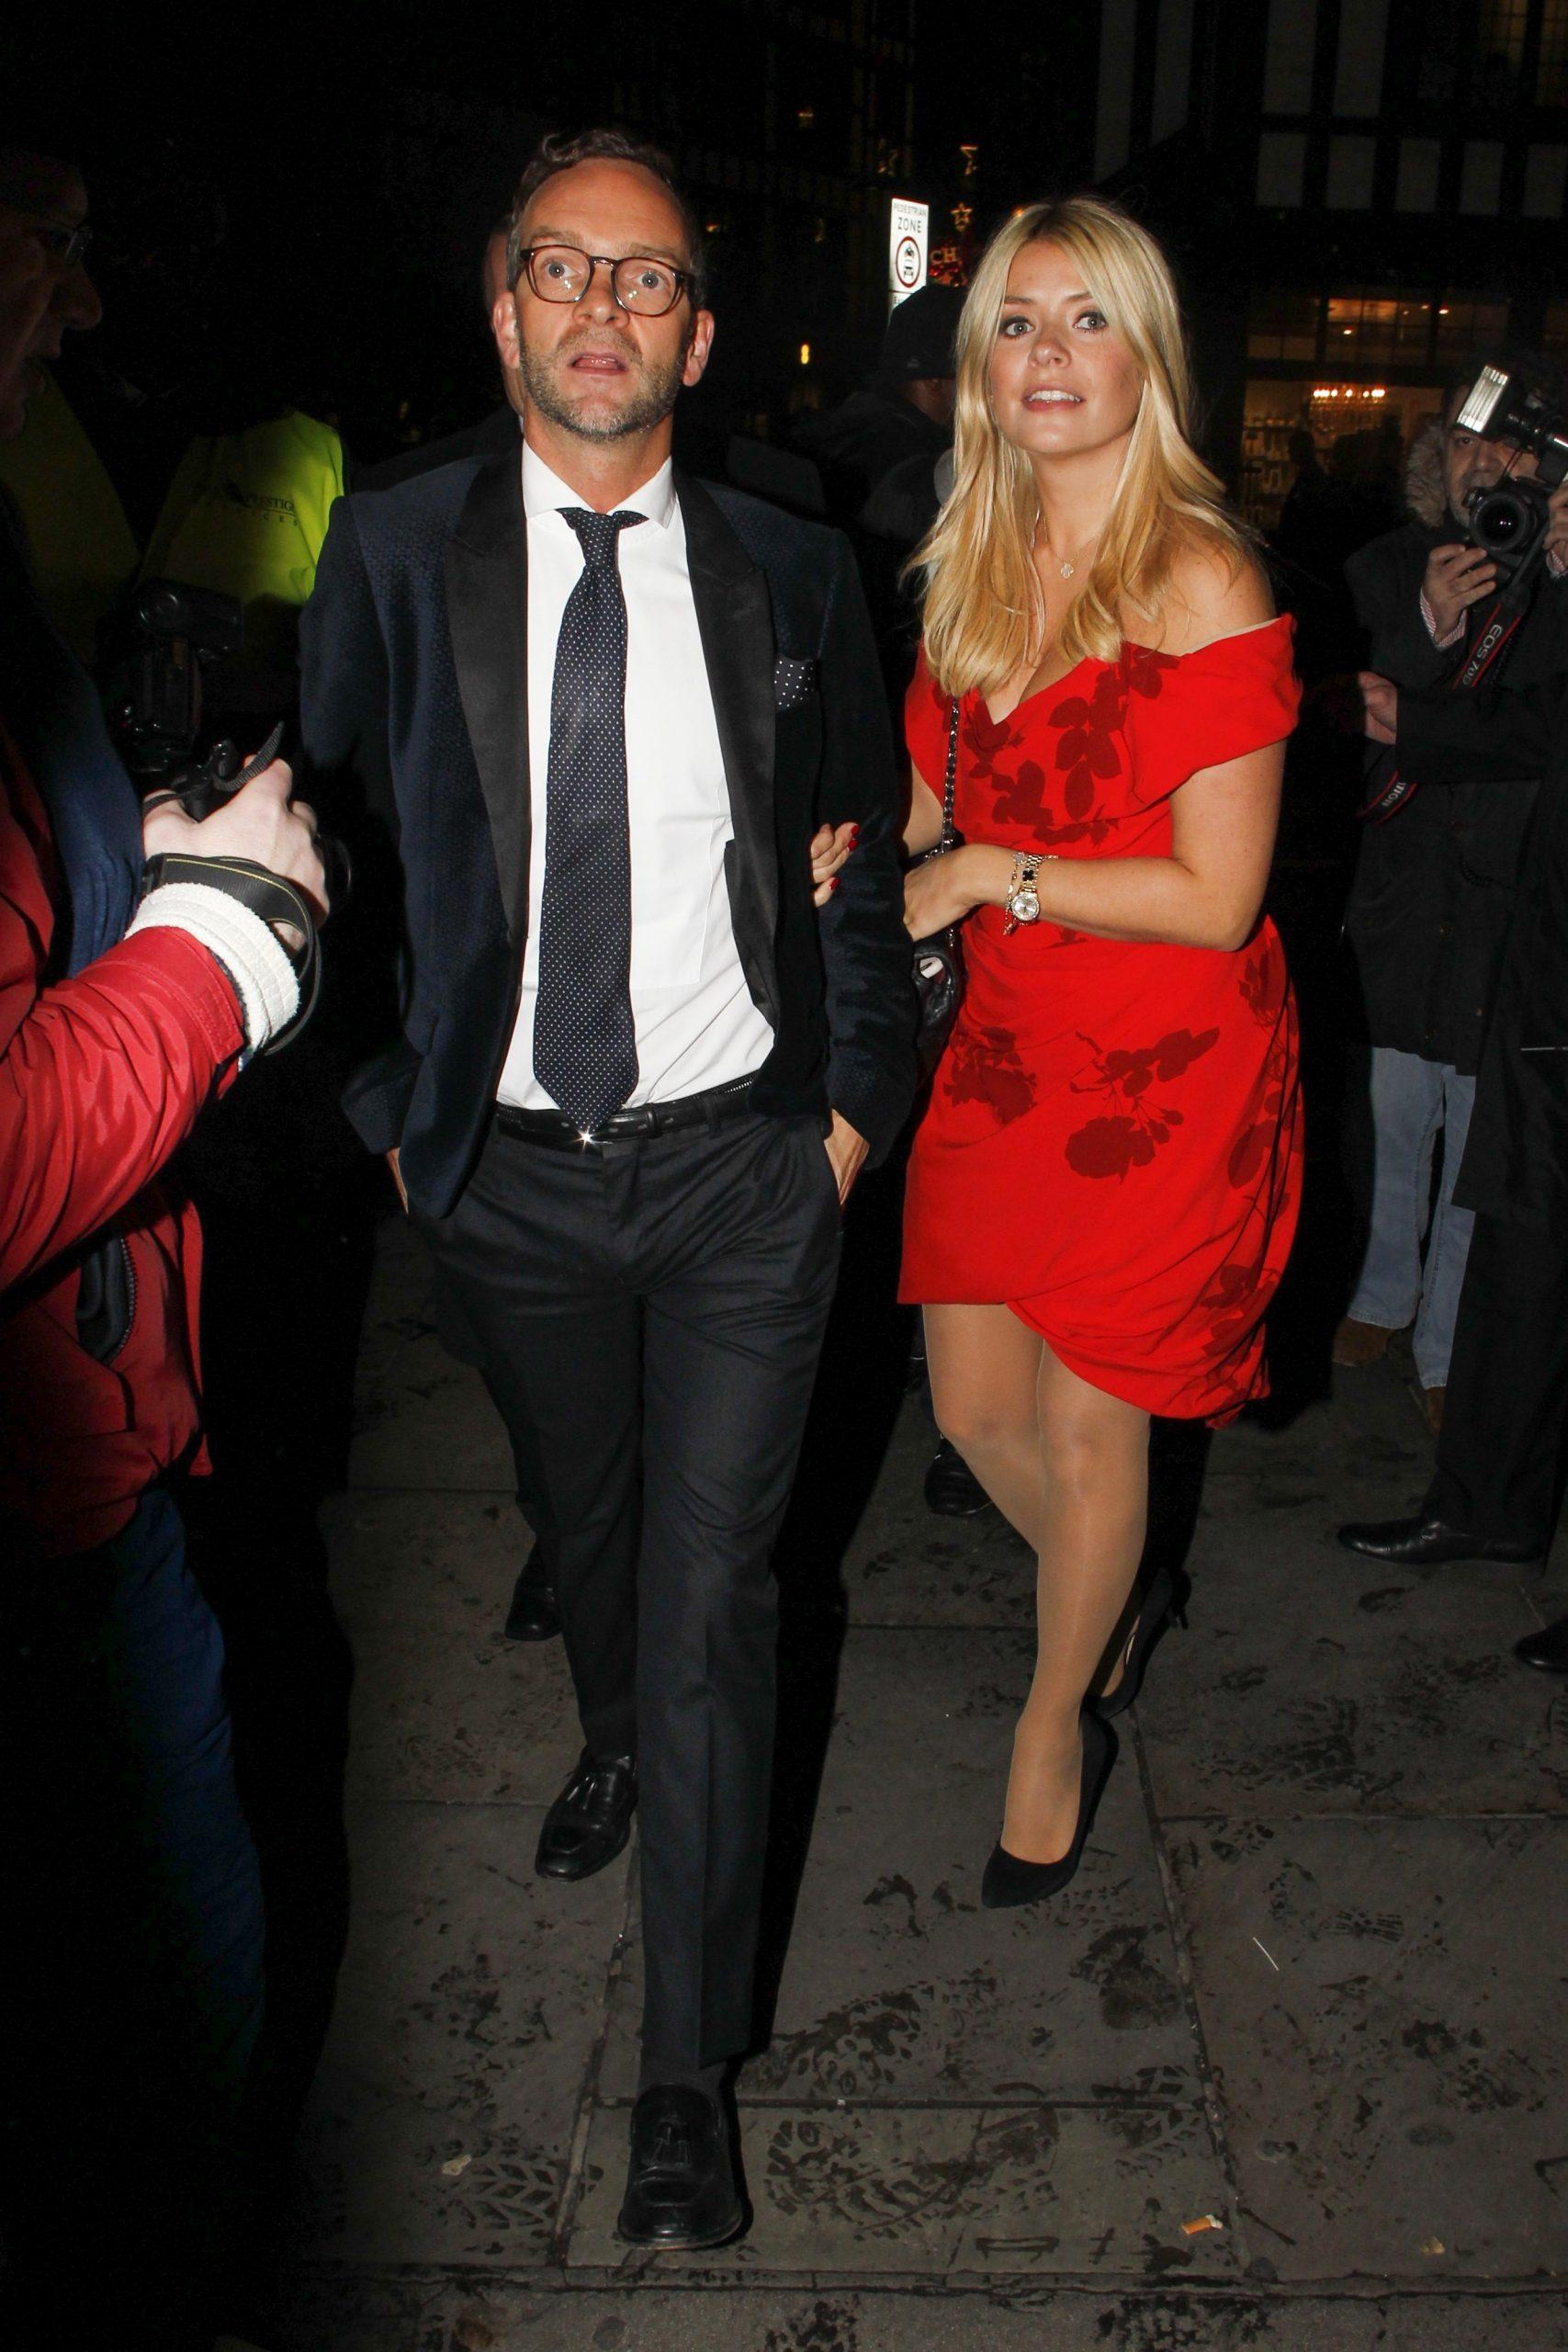 Dan Baldwin and Holly Willoughy